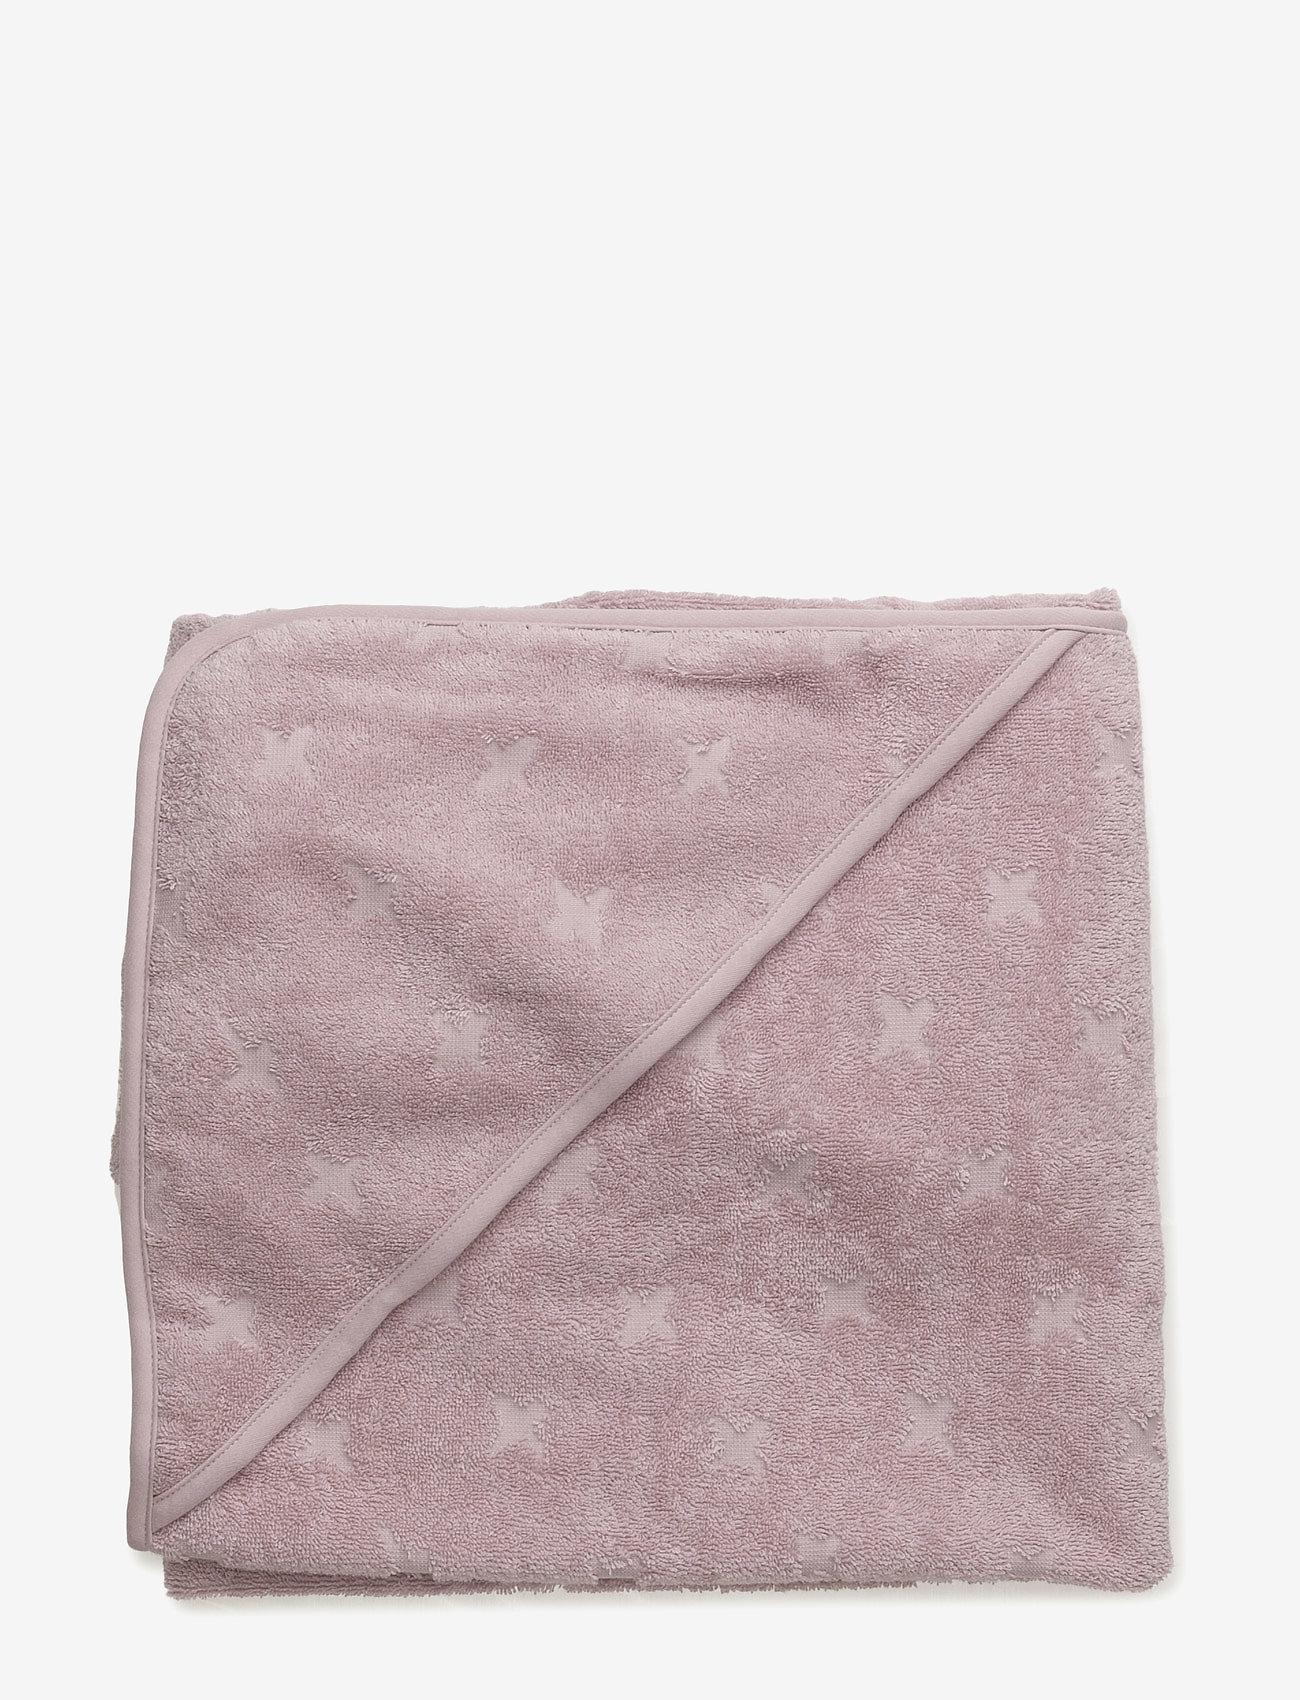 Müsli by Green Cotton - Baby towel - akcesoria - rose - 1